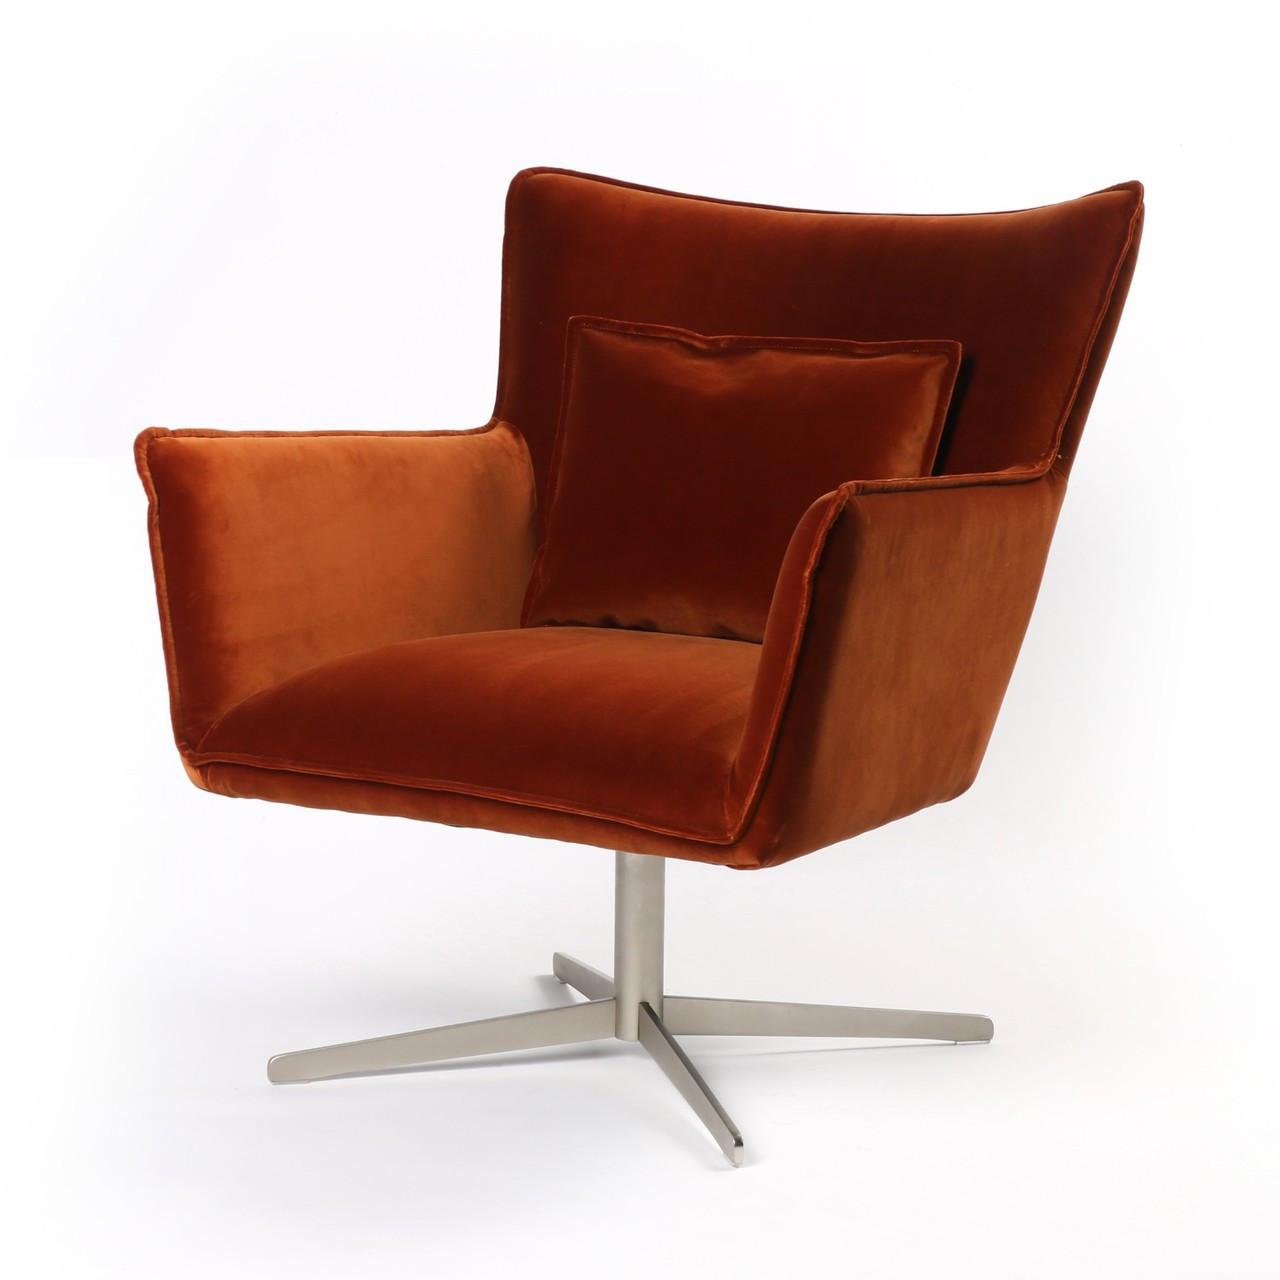 Magnificent Jacob Velvet Swivel Wing Chair Theyellowbook Wood Chair Design Ideas Theyellowbookinfo